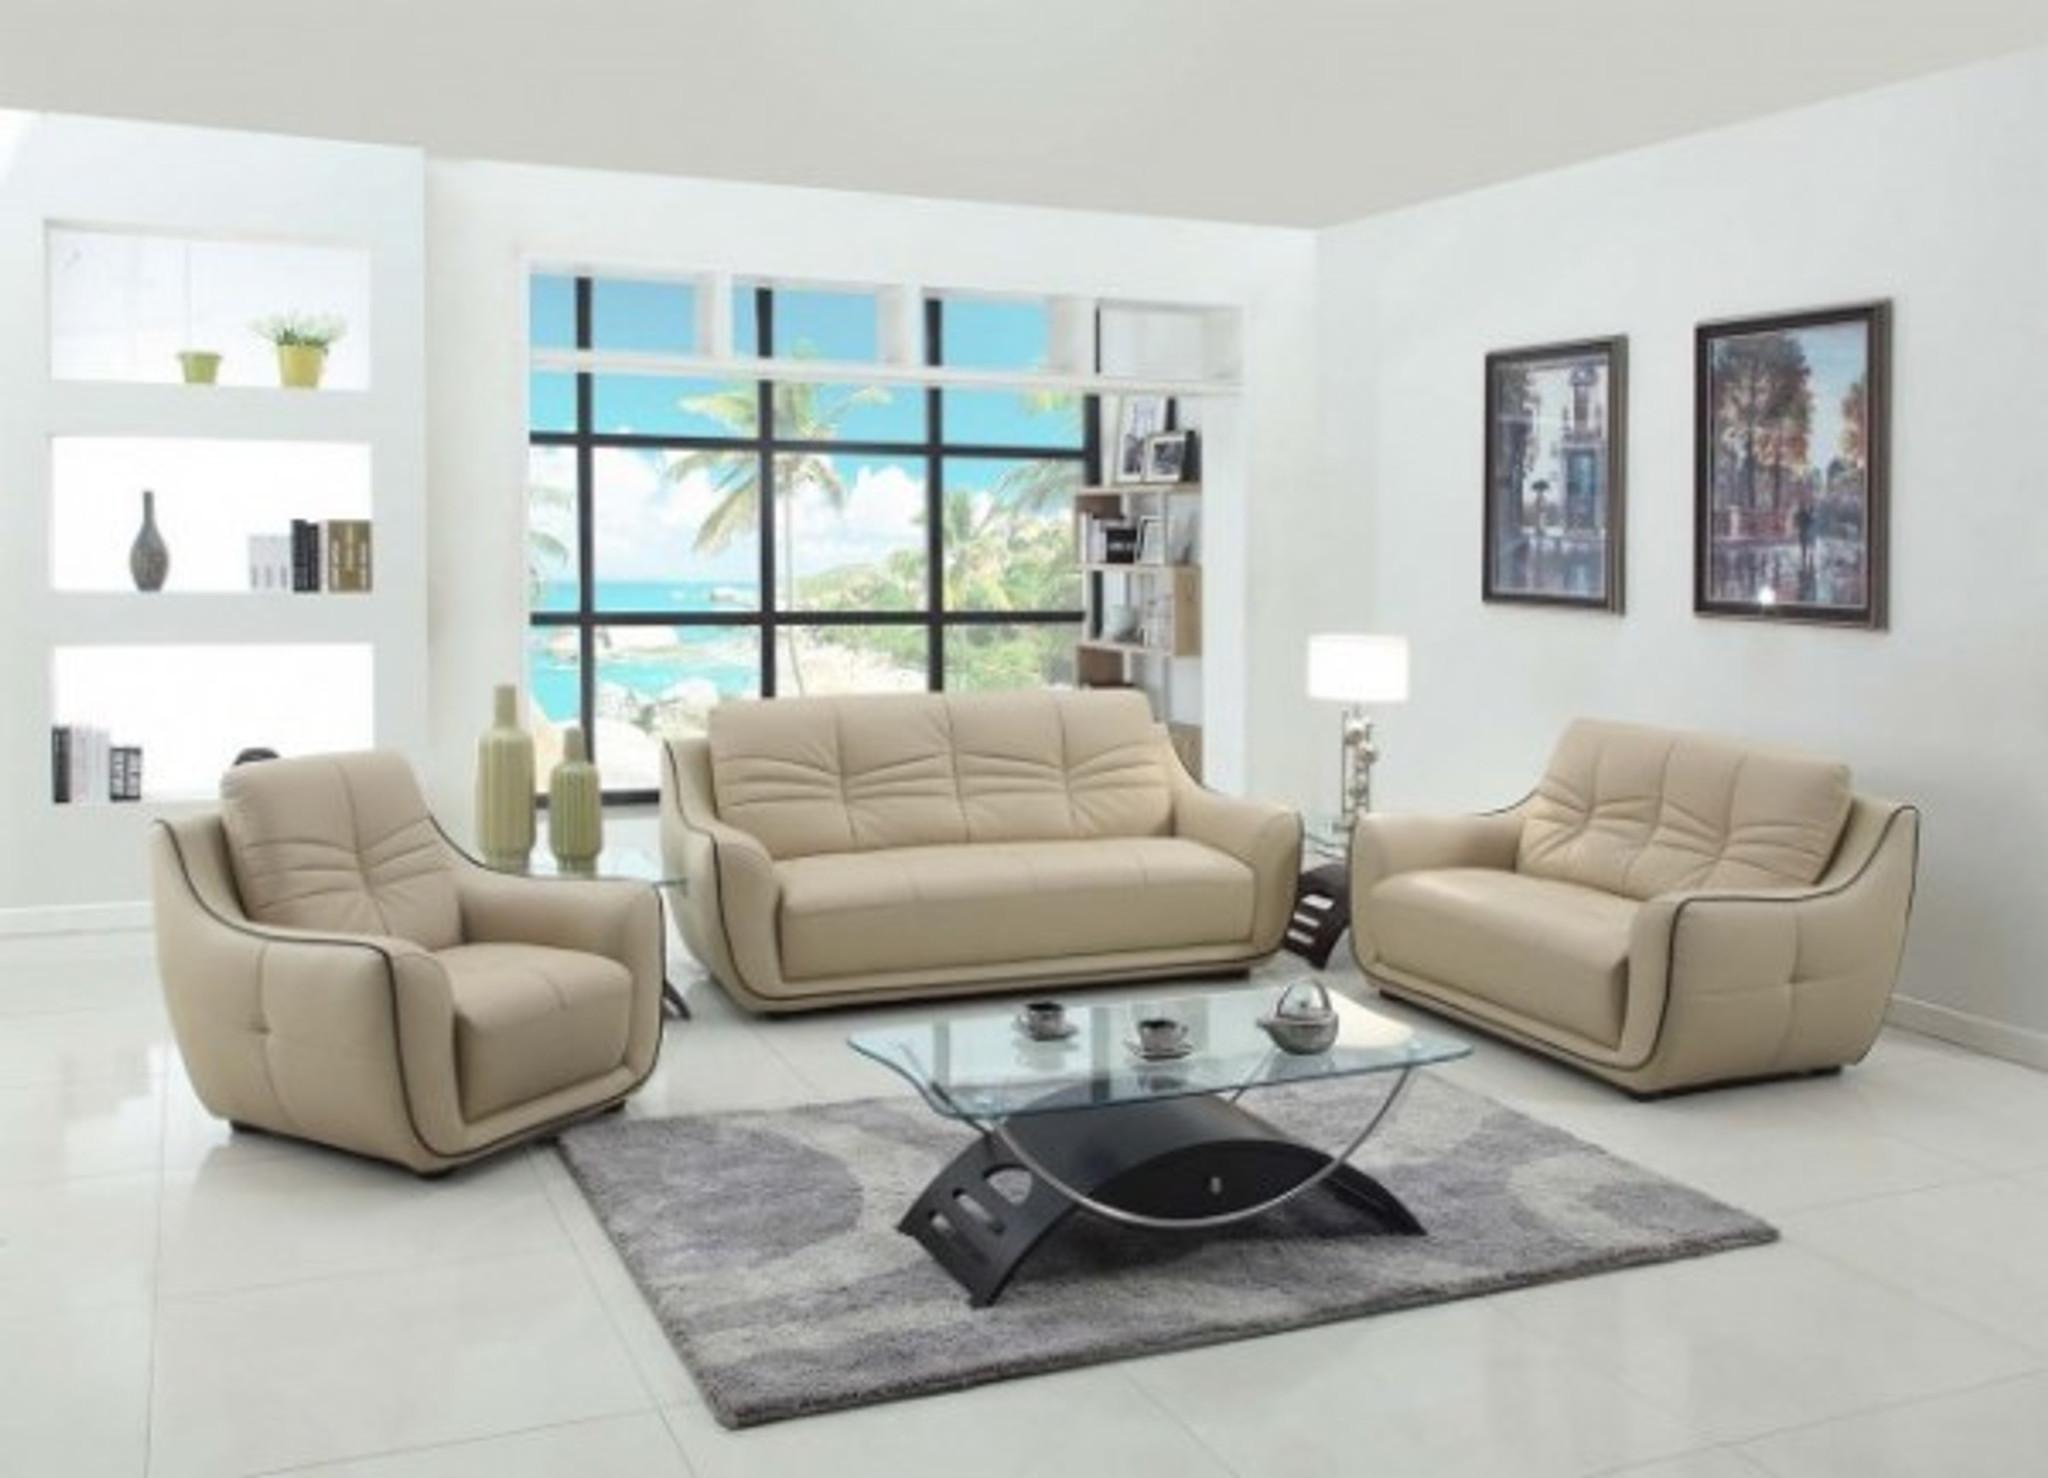 kassa mall home furniture u2088 beige fashionable sofa set in rh kassamall com beige leather recliner sofa set beige leather couch set